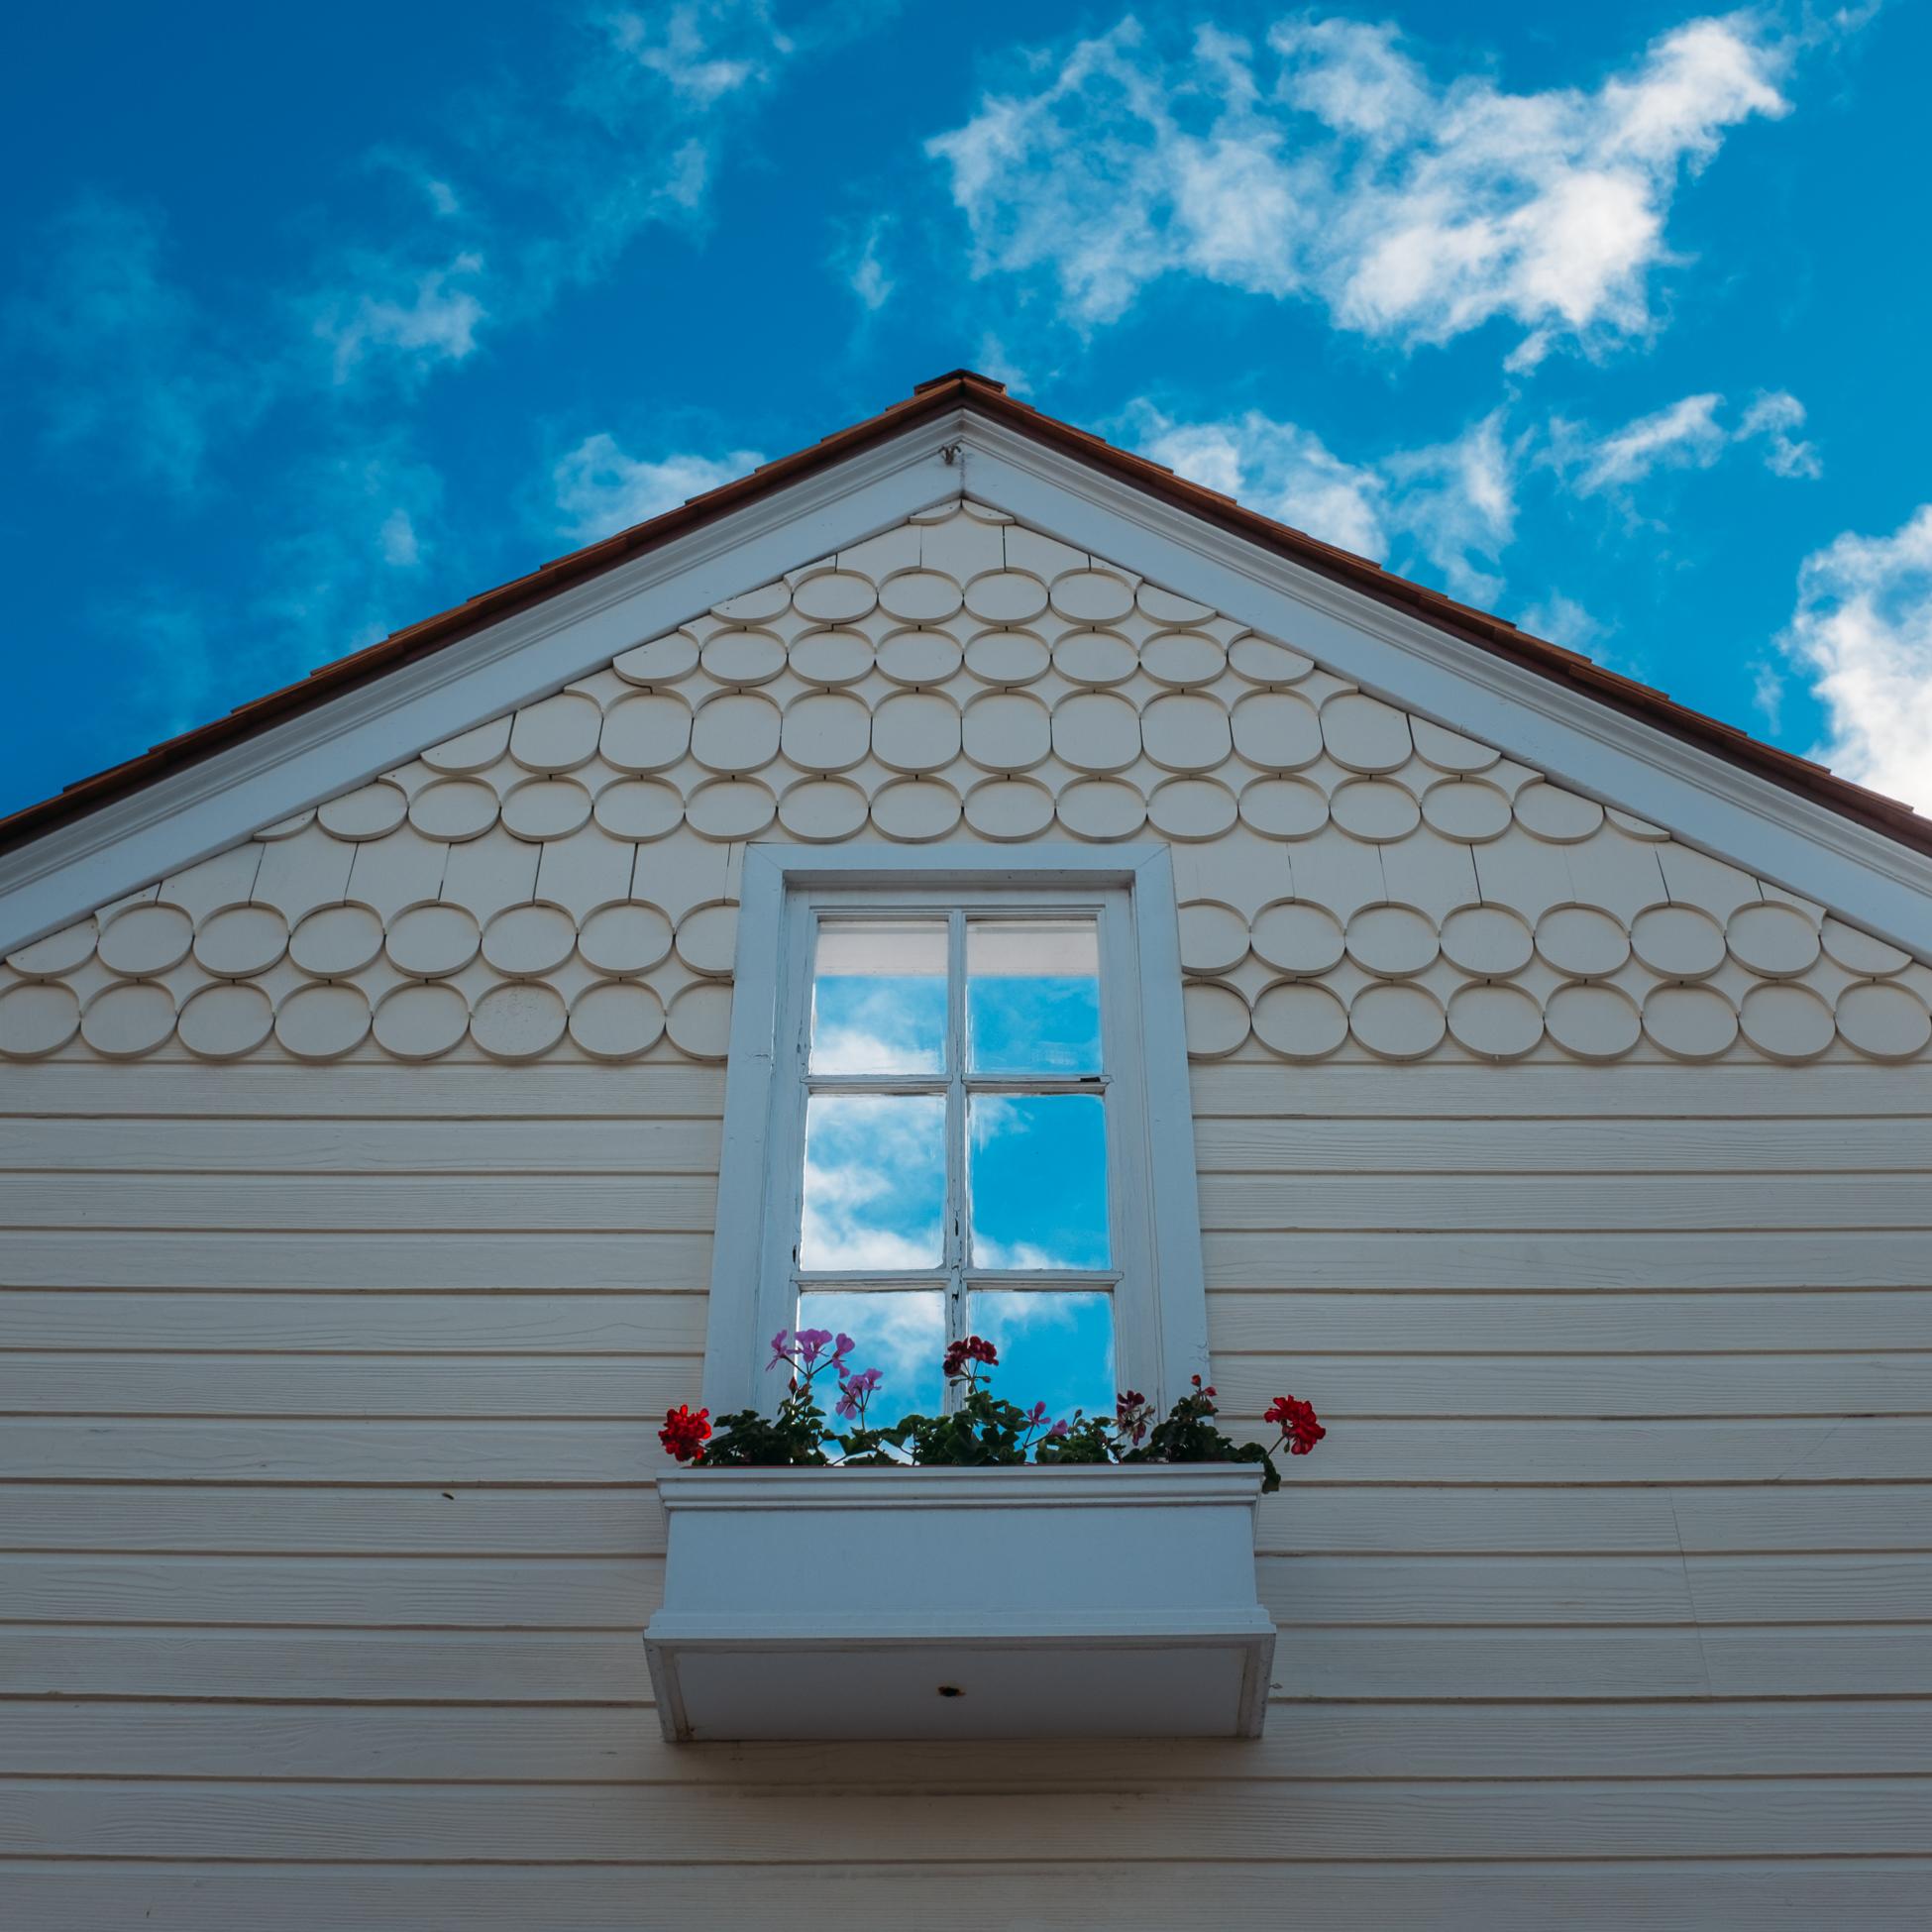 Sky in the Window, San Diego, 2015